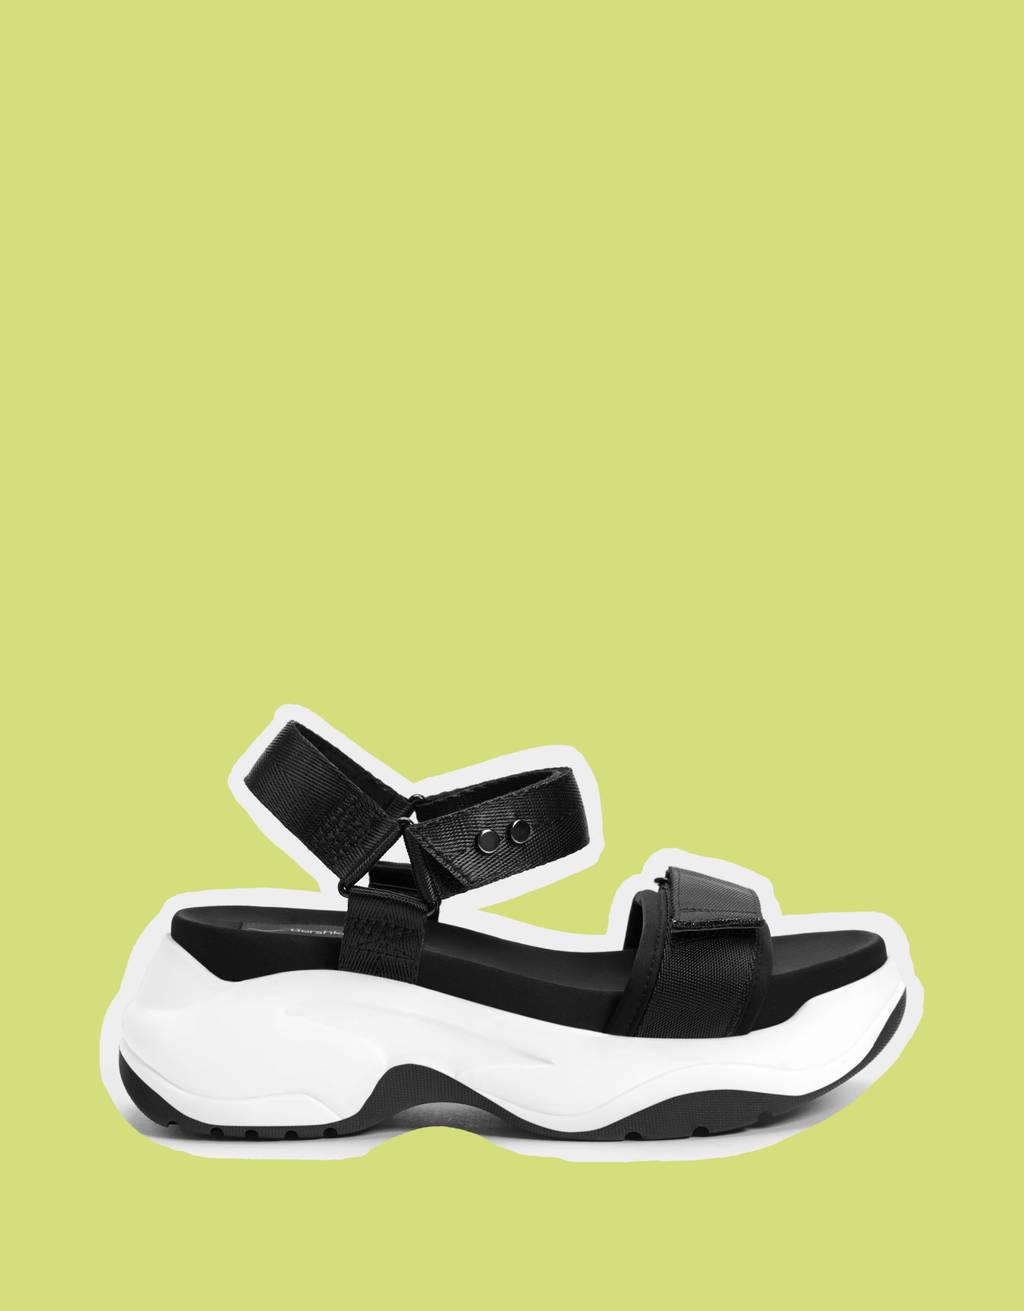 716c34a06d65 Women s Shoes - Spring Summer 2019